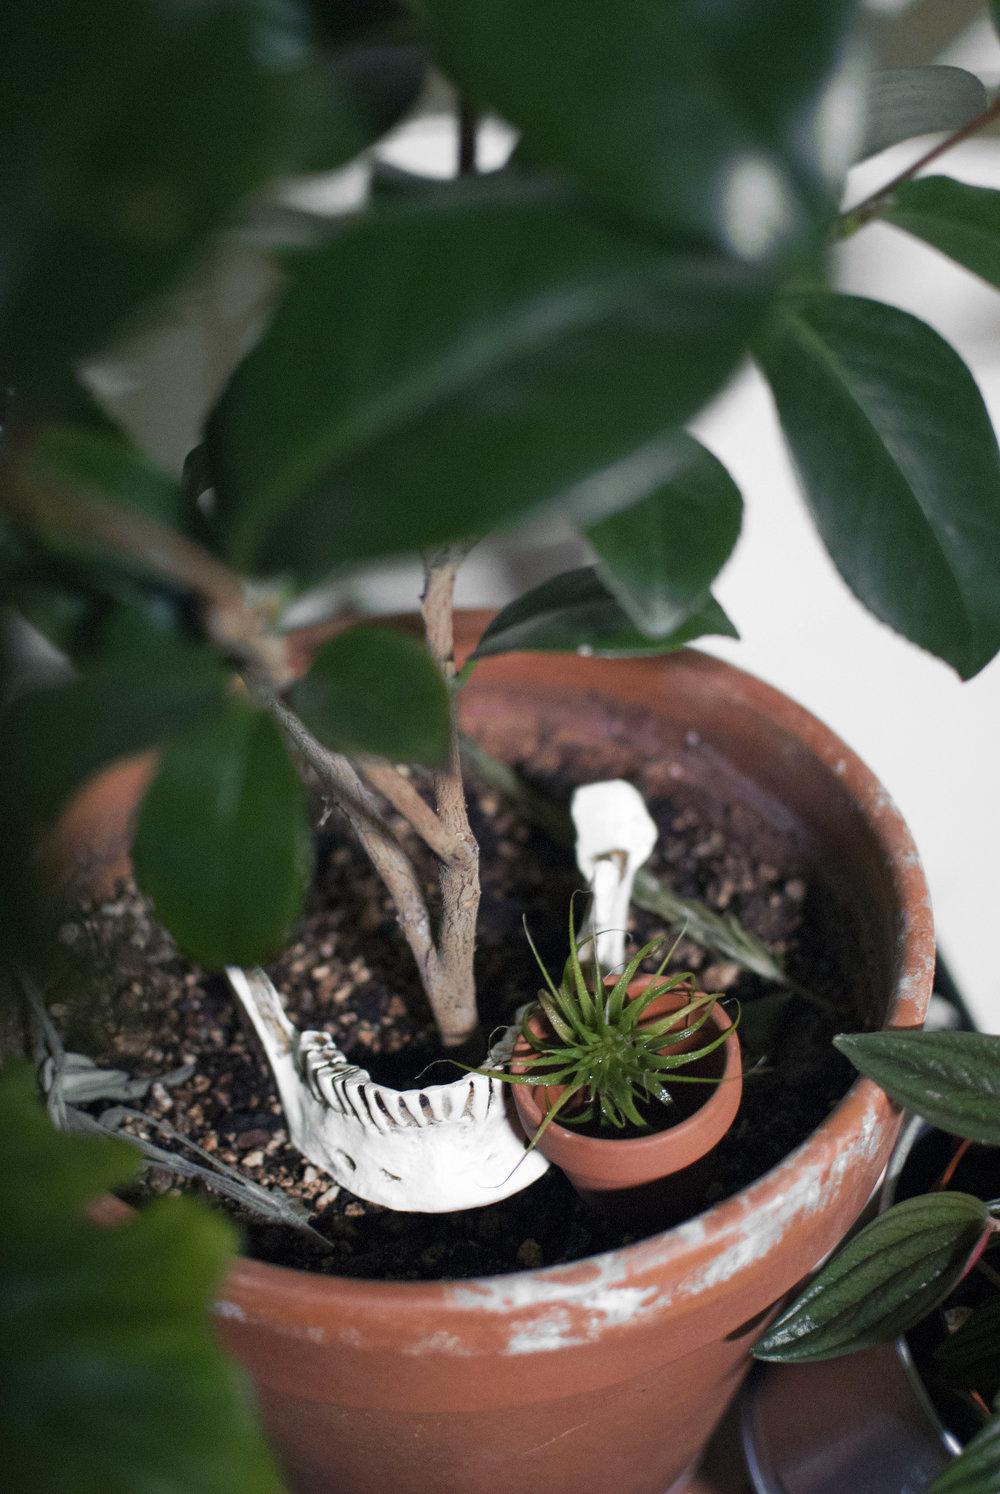 Skeleton parts (jaw bone) in a Camellia garden pot, next to an freaky alien  Tillandsia .